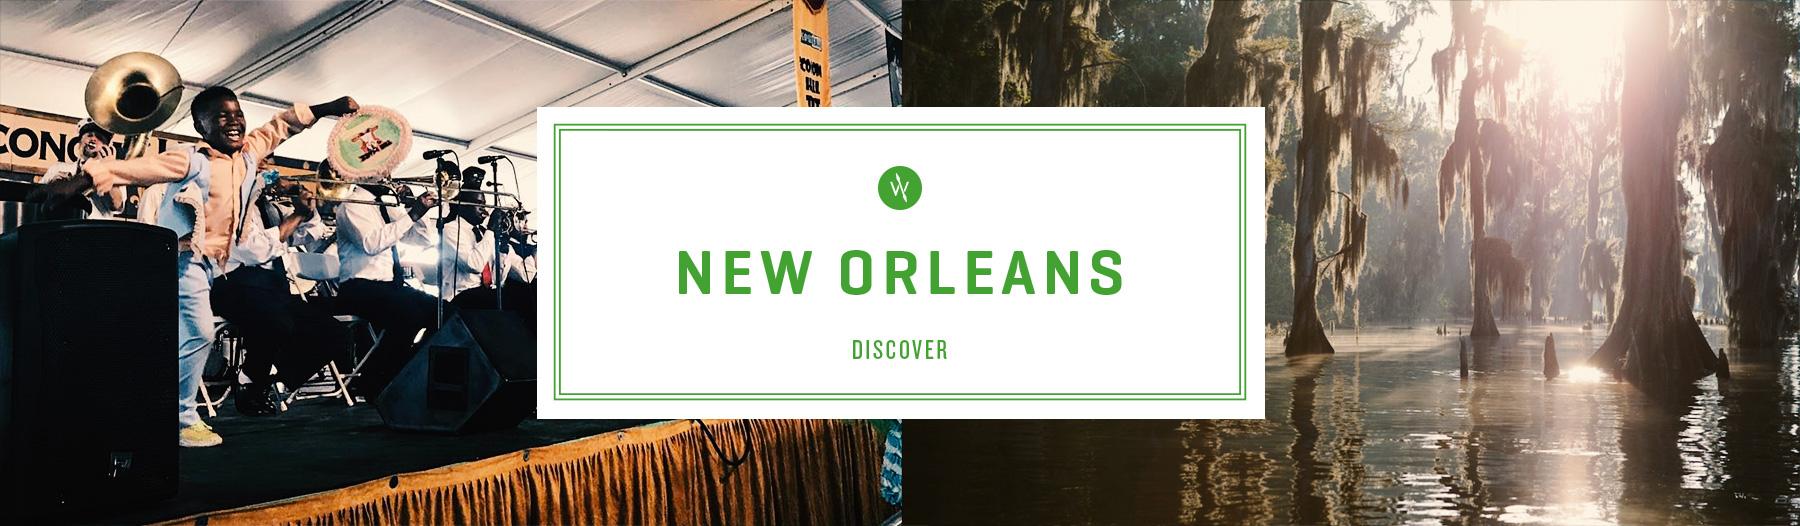 WILDSAM-New_Orleans-HEADER.jpg